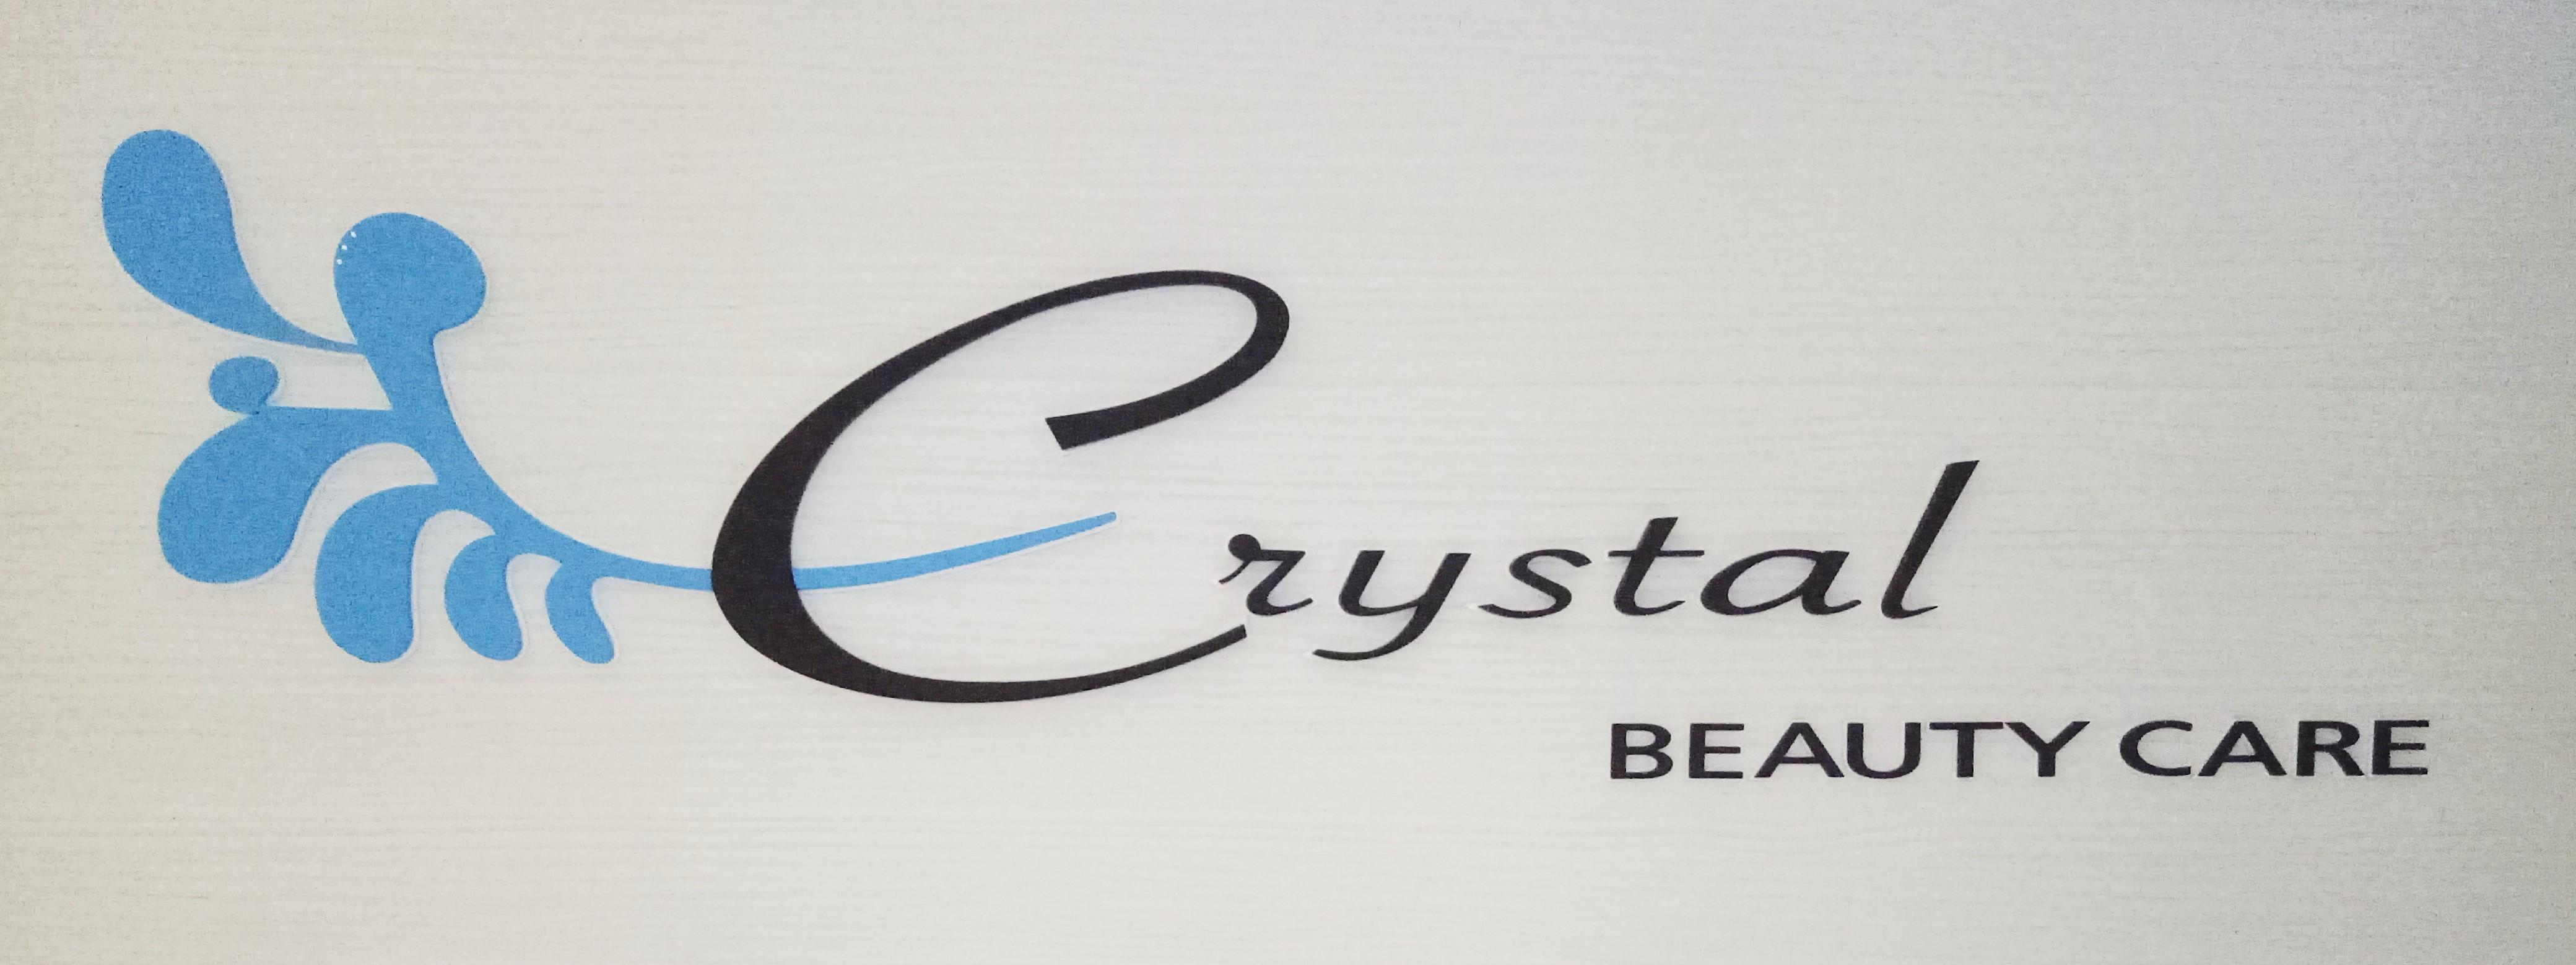 Crystal Beauty Care